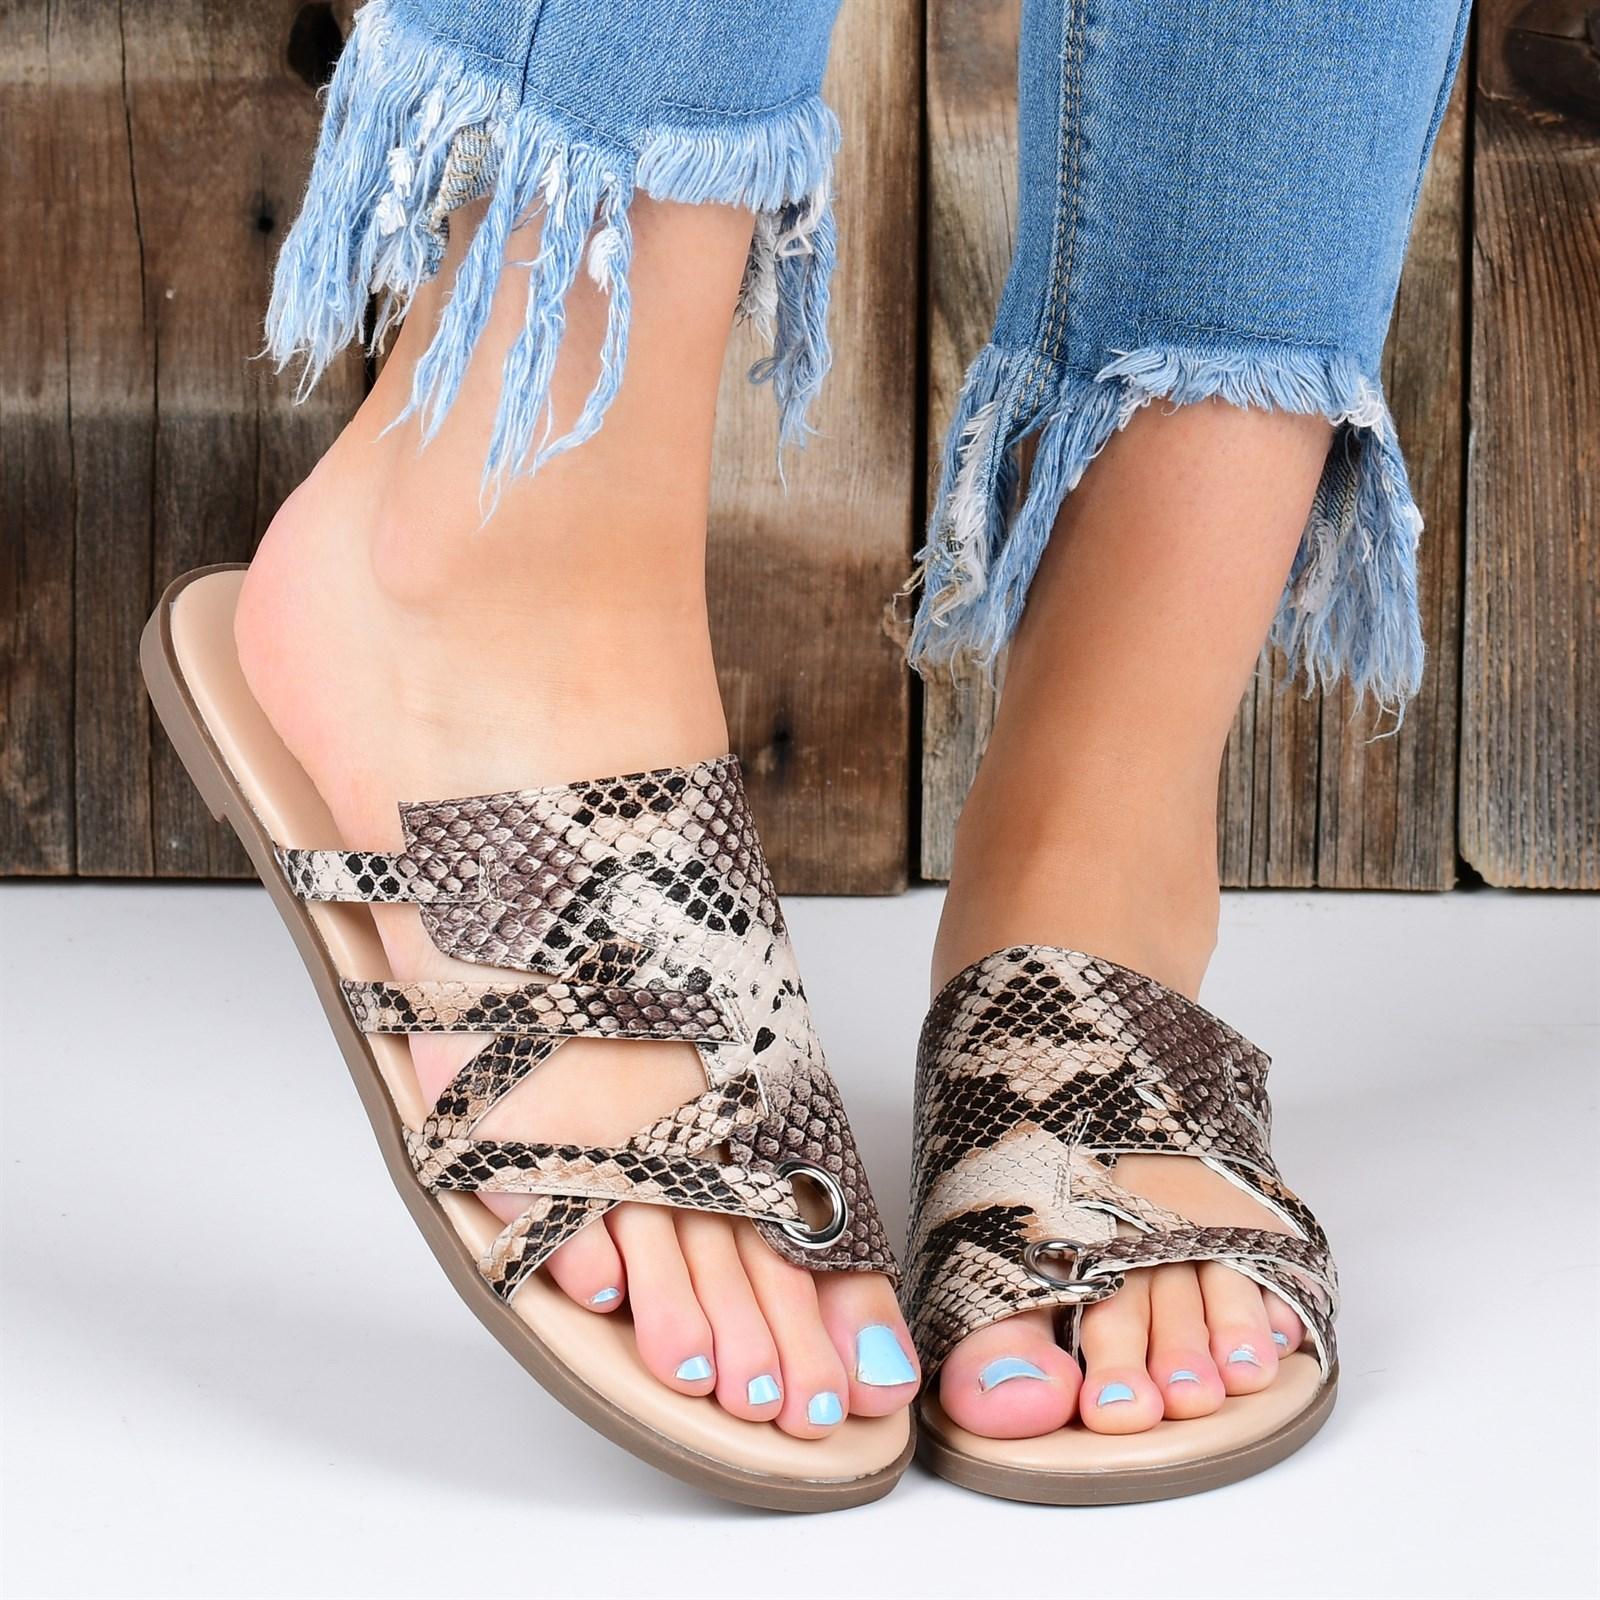 Grommet Strappy Sandal